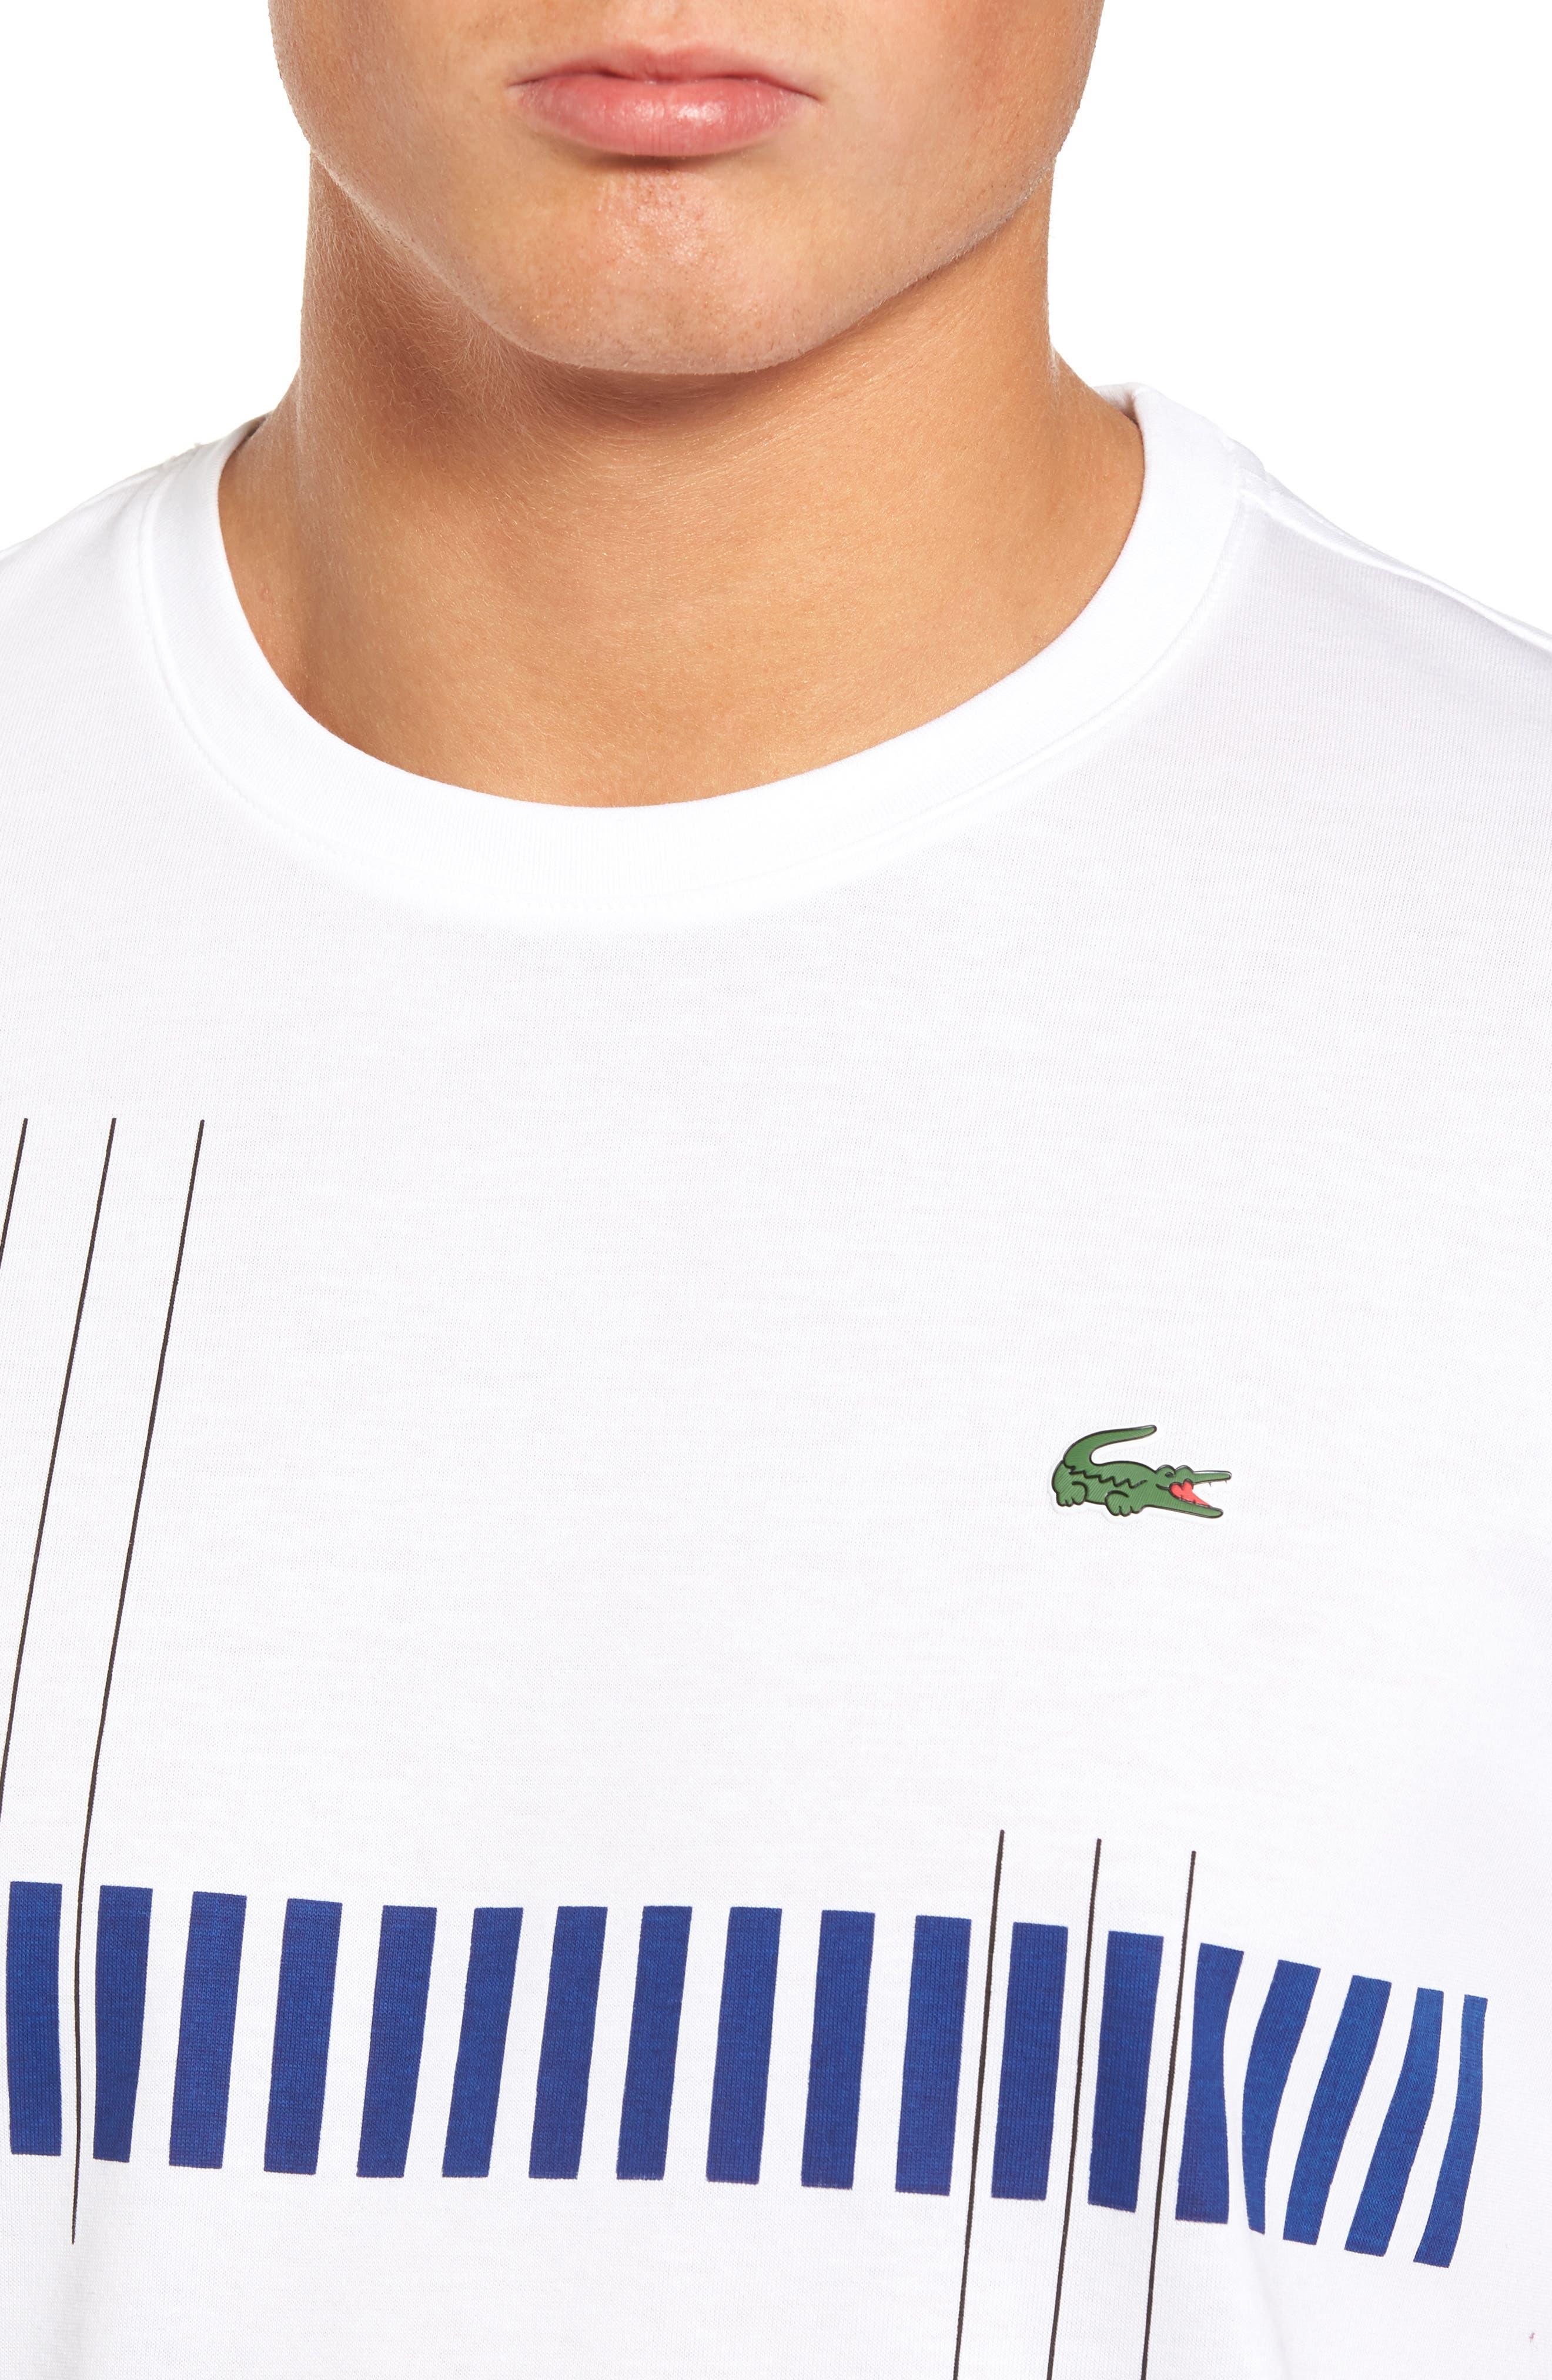 Tech Vertical Stripe Graphic T-Shirt,                             Alternate thumbnail 4, color,                             U88 White/ Ocean-Ladybird-Blac